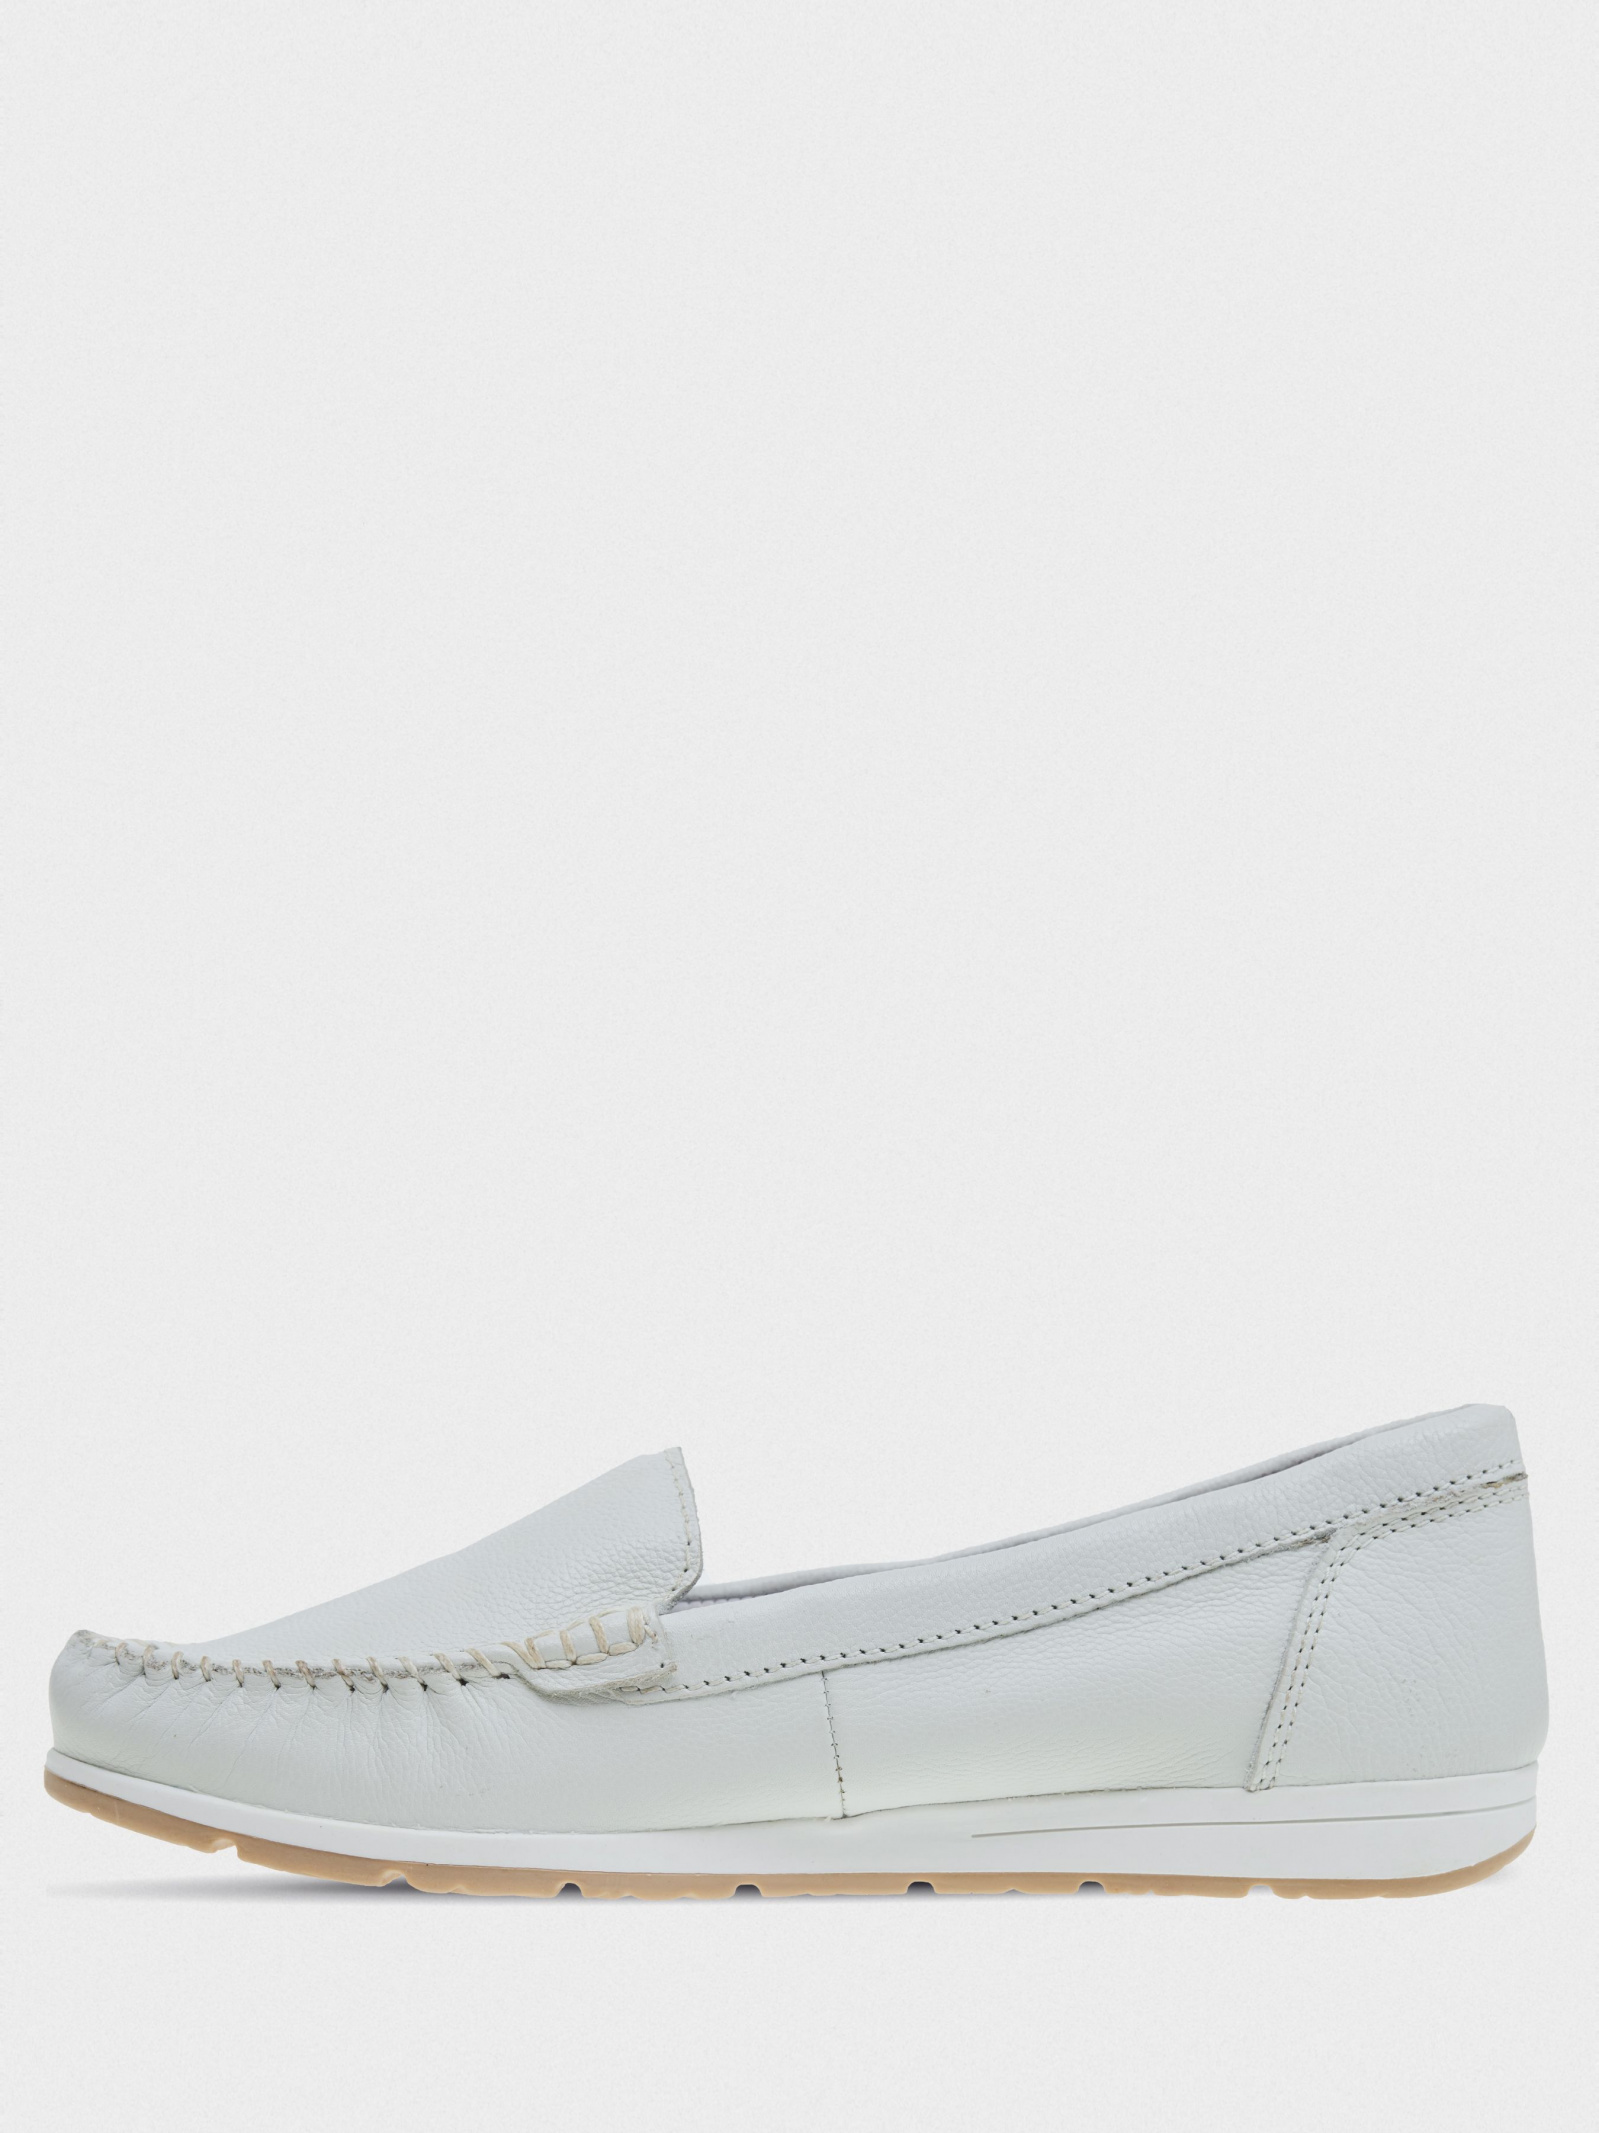 Мокасины женские Marco Tozzi 3H352 размеры обуви, 2017